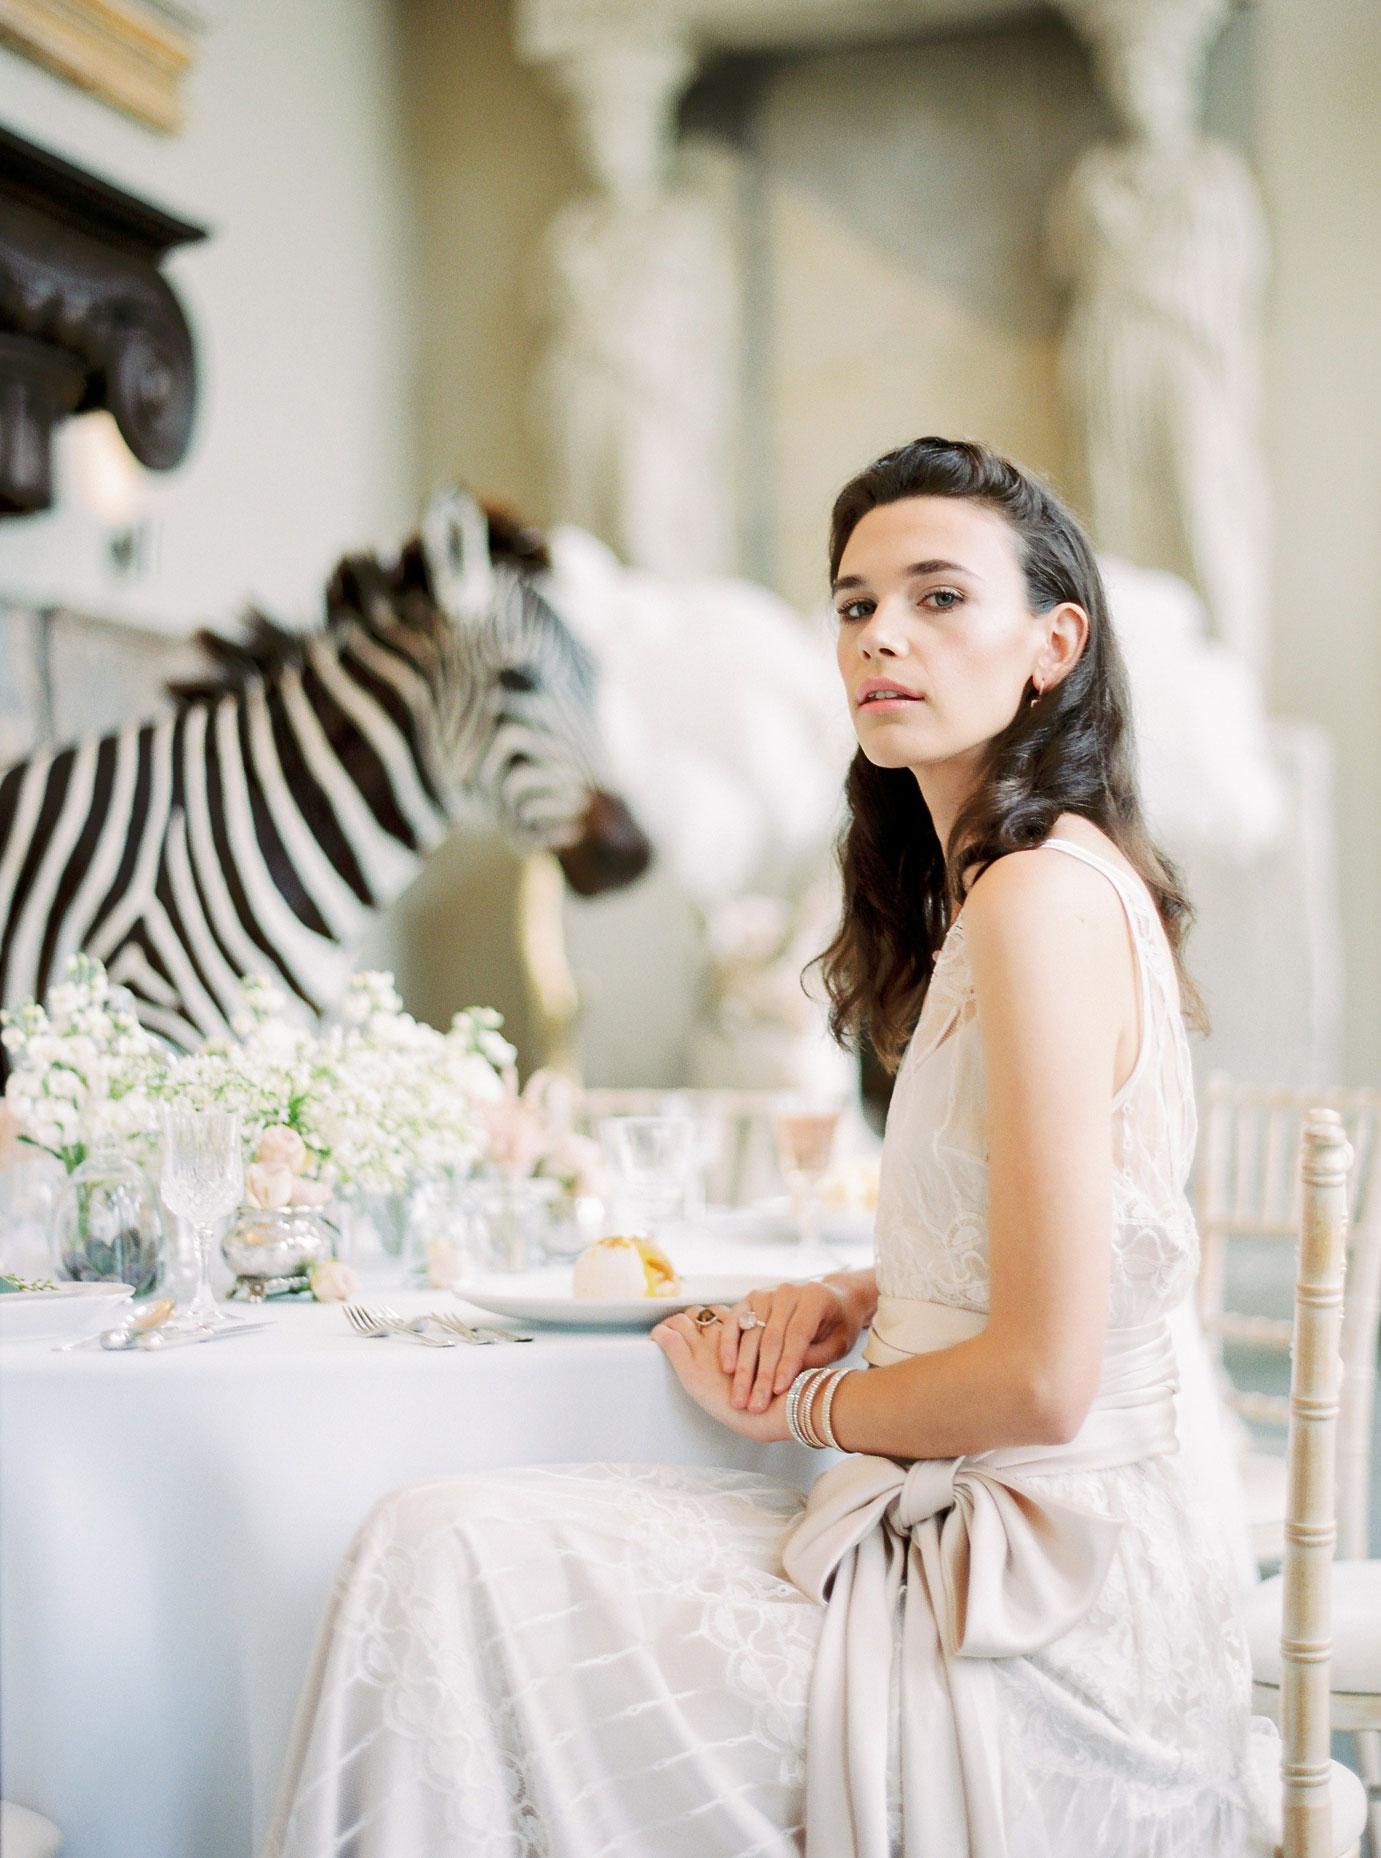 sarah-harper-floral-design-luxury-wedding-florist-flowers-oxfordshite-cotsworlds-gallery-Lucy_Davenport_Photography_Aynhoe_SpringSummer-023